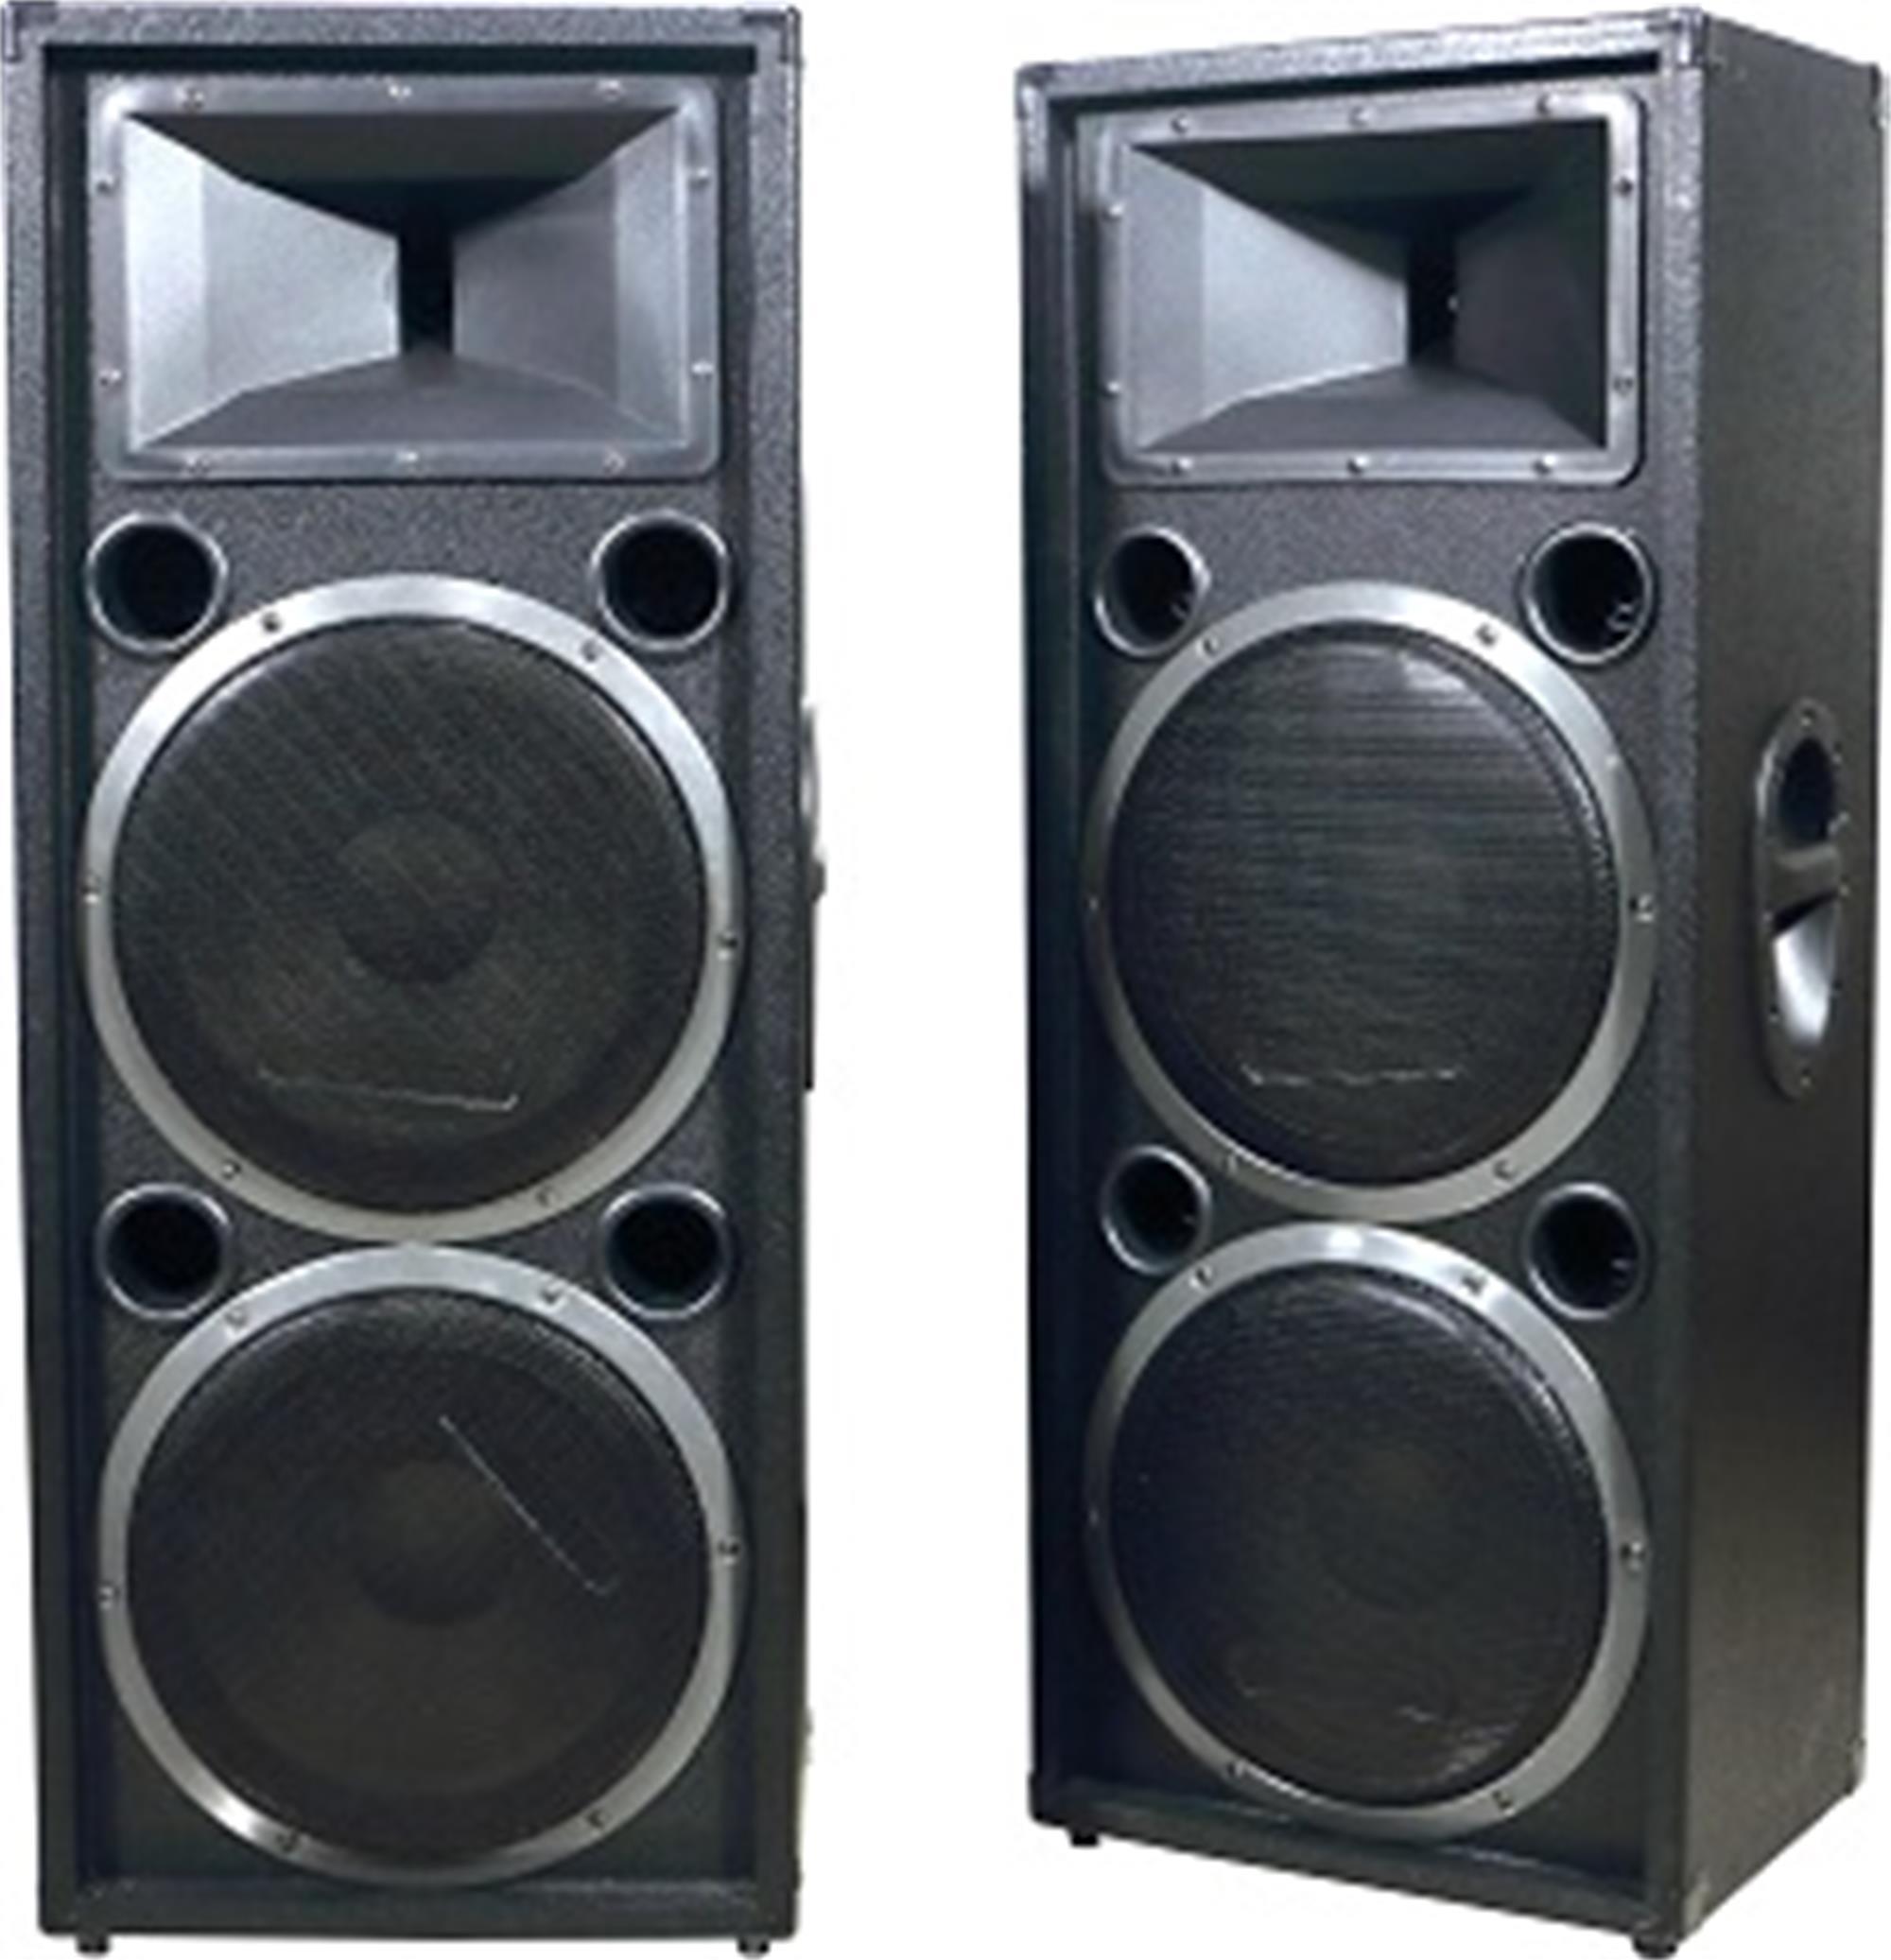 Tower Speaker For Sale Floor Standing Speakers Prices Brands Videoke Wiring Cyberhome Cy 128 12 800w System